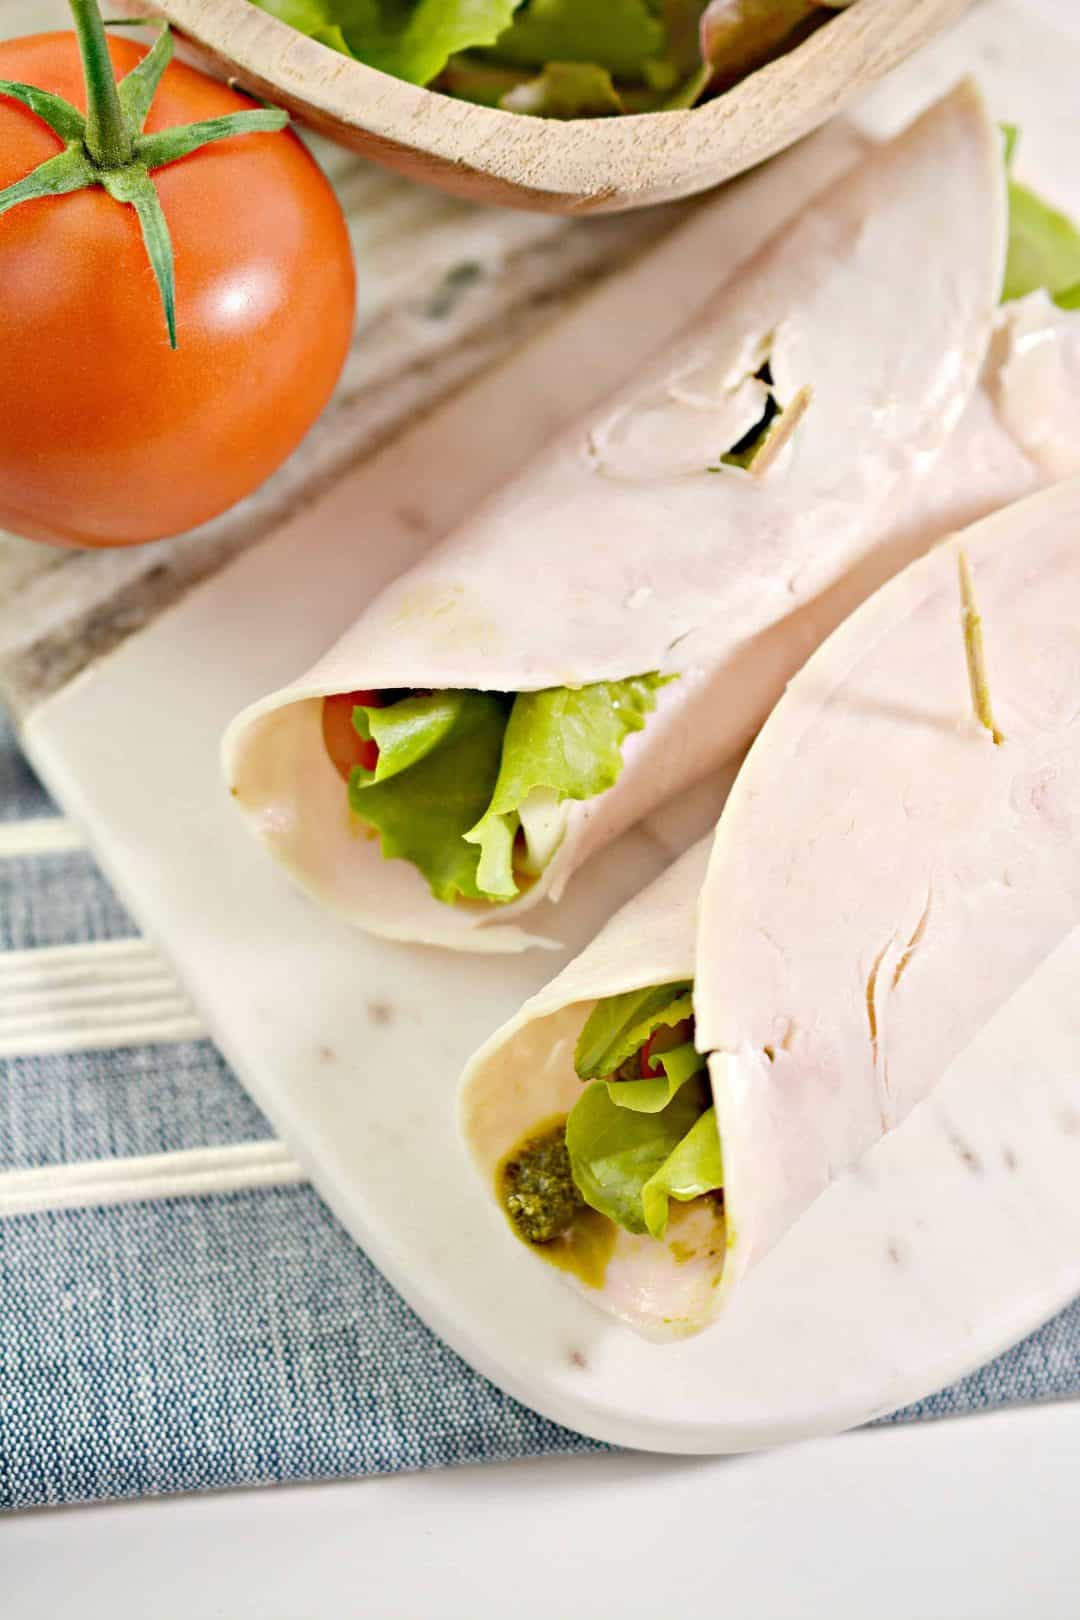 Turkey Roll Up with Pesto